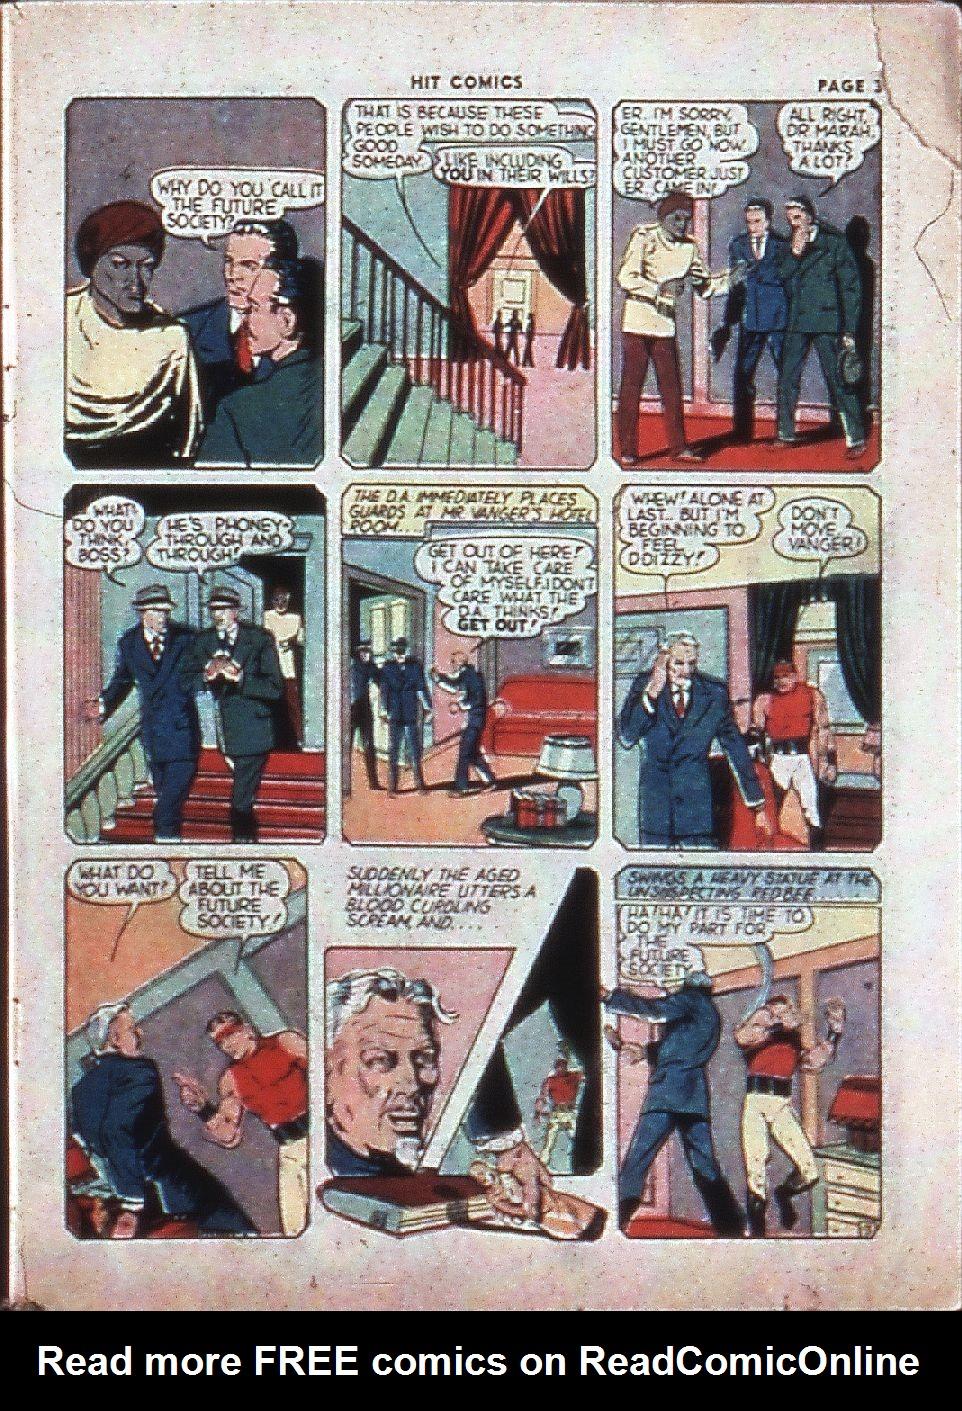 Read online Hit Comics comic -  Issue #4 - 5